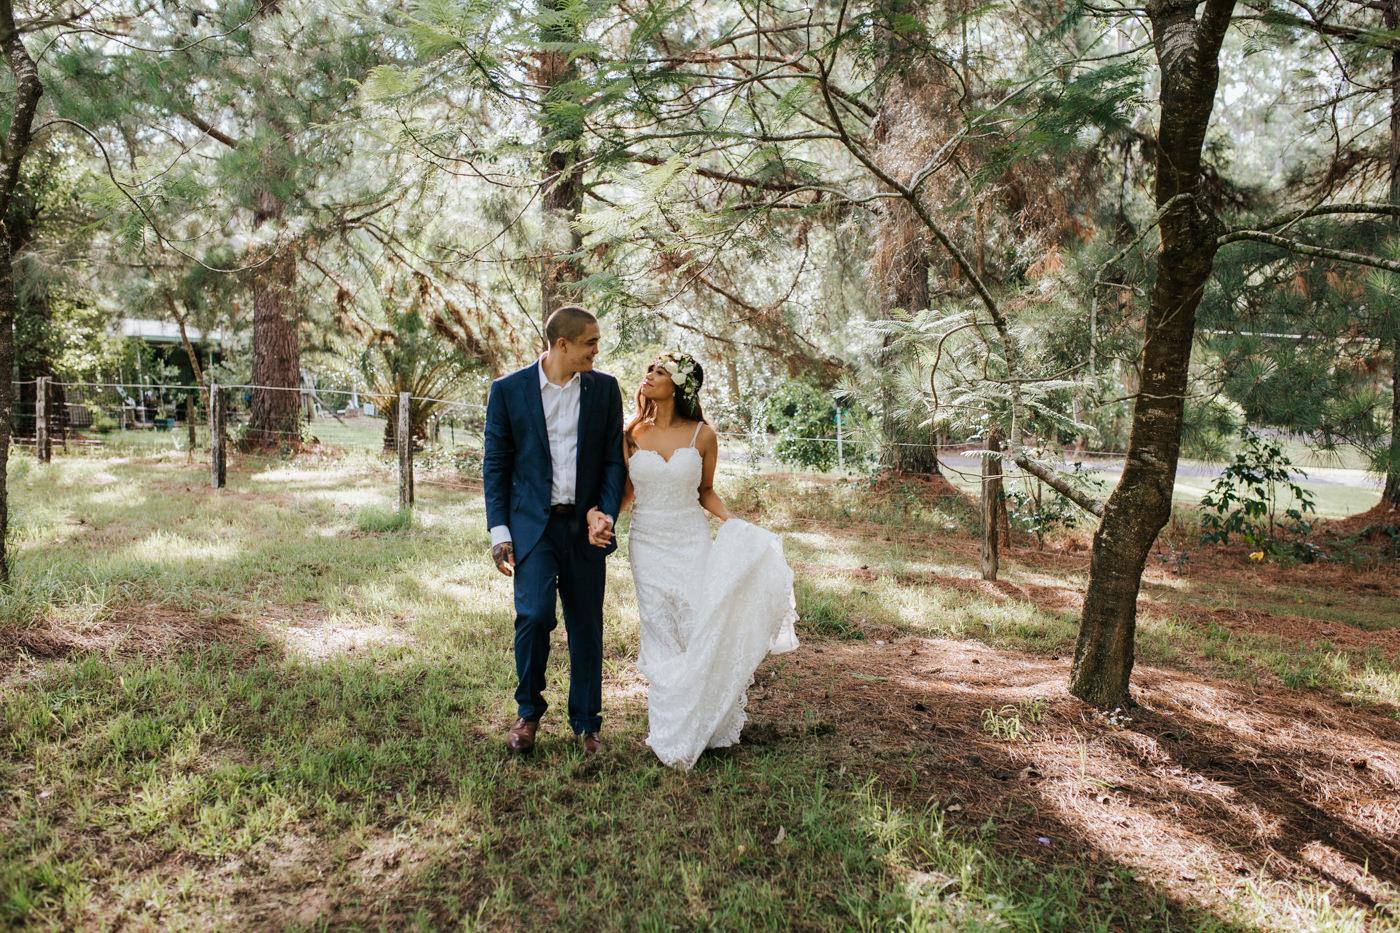 Nick & Vanezza - Fernbank Farm Wedding - Samantha Heather Photography-130.jpg